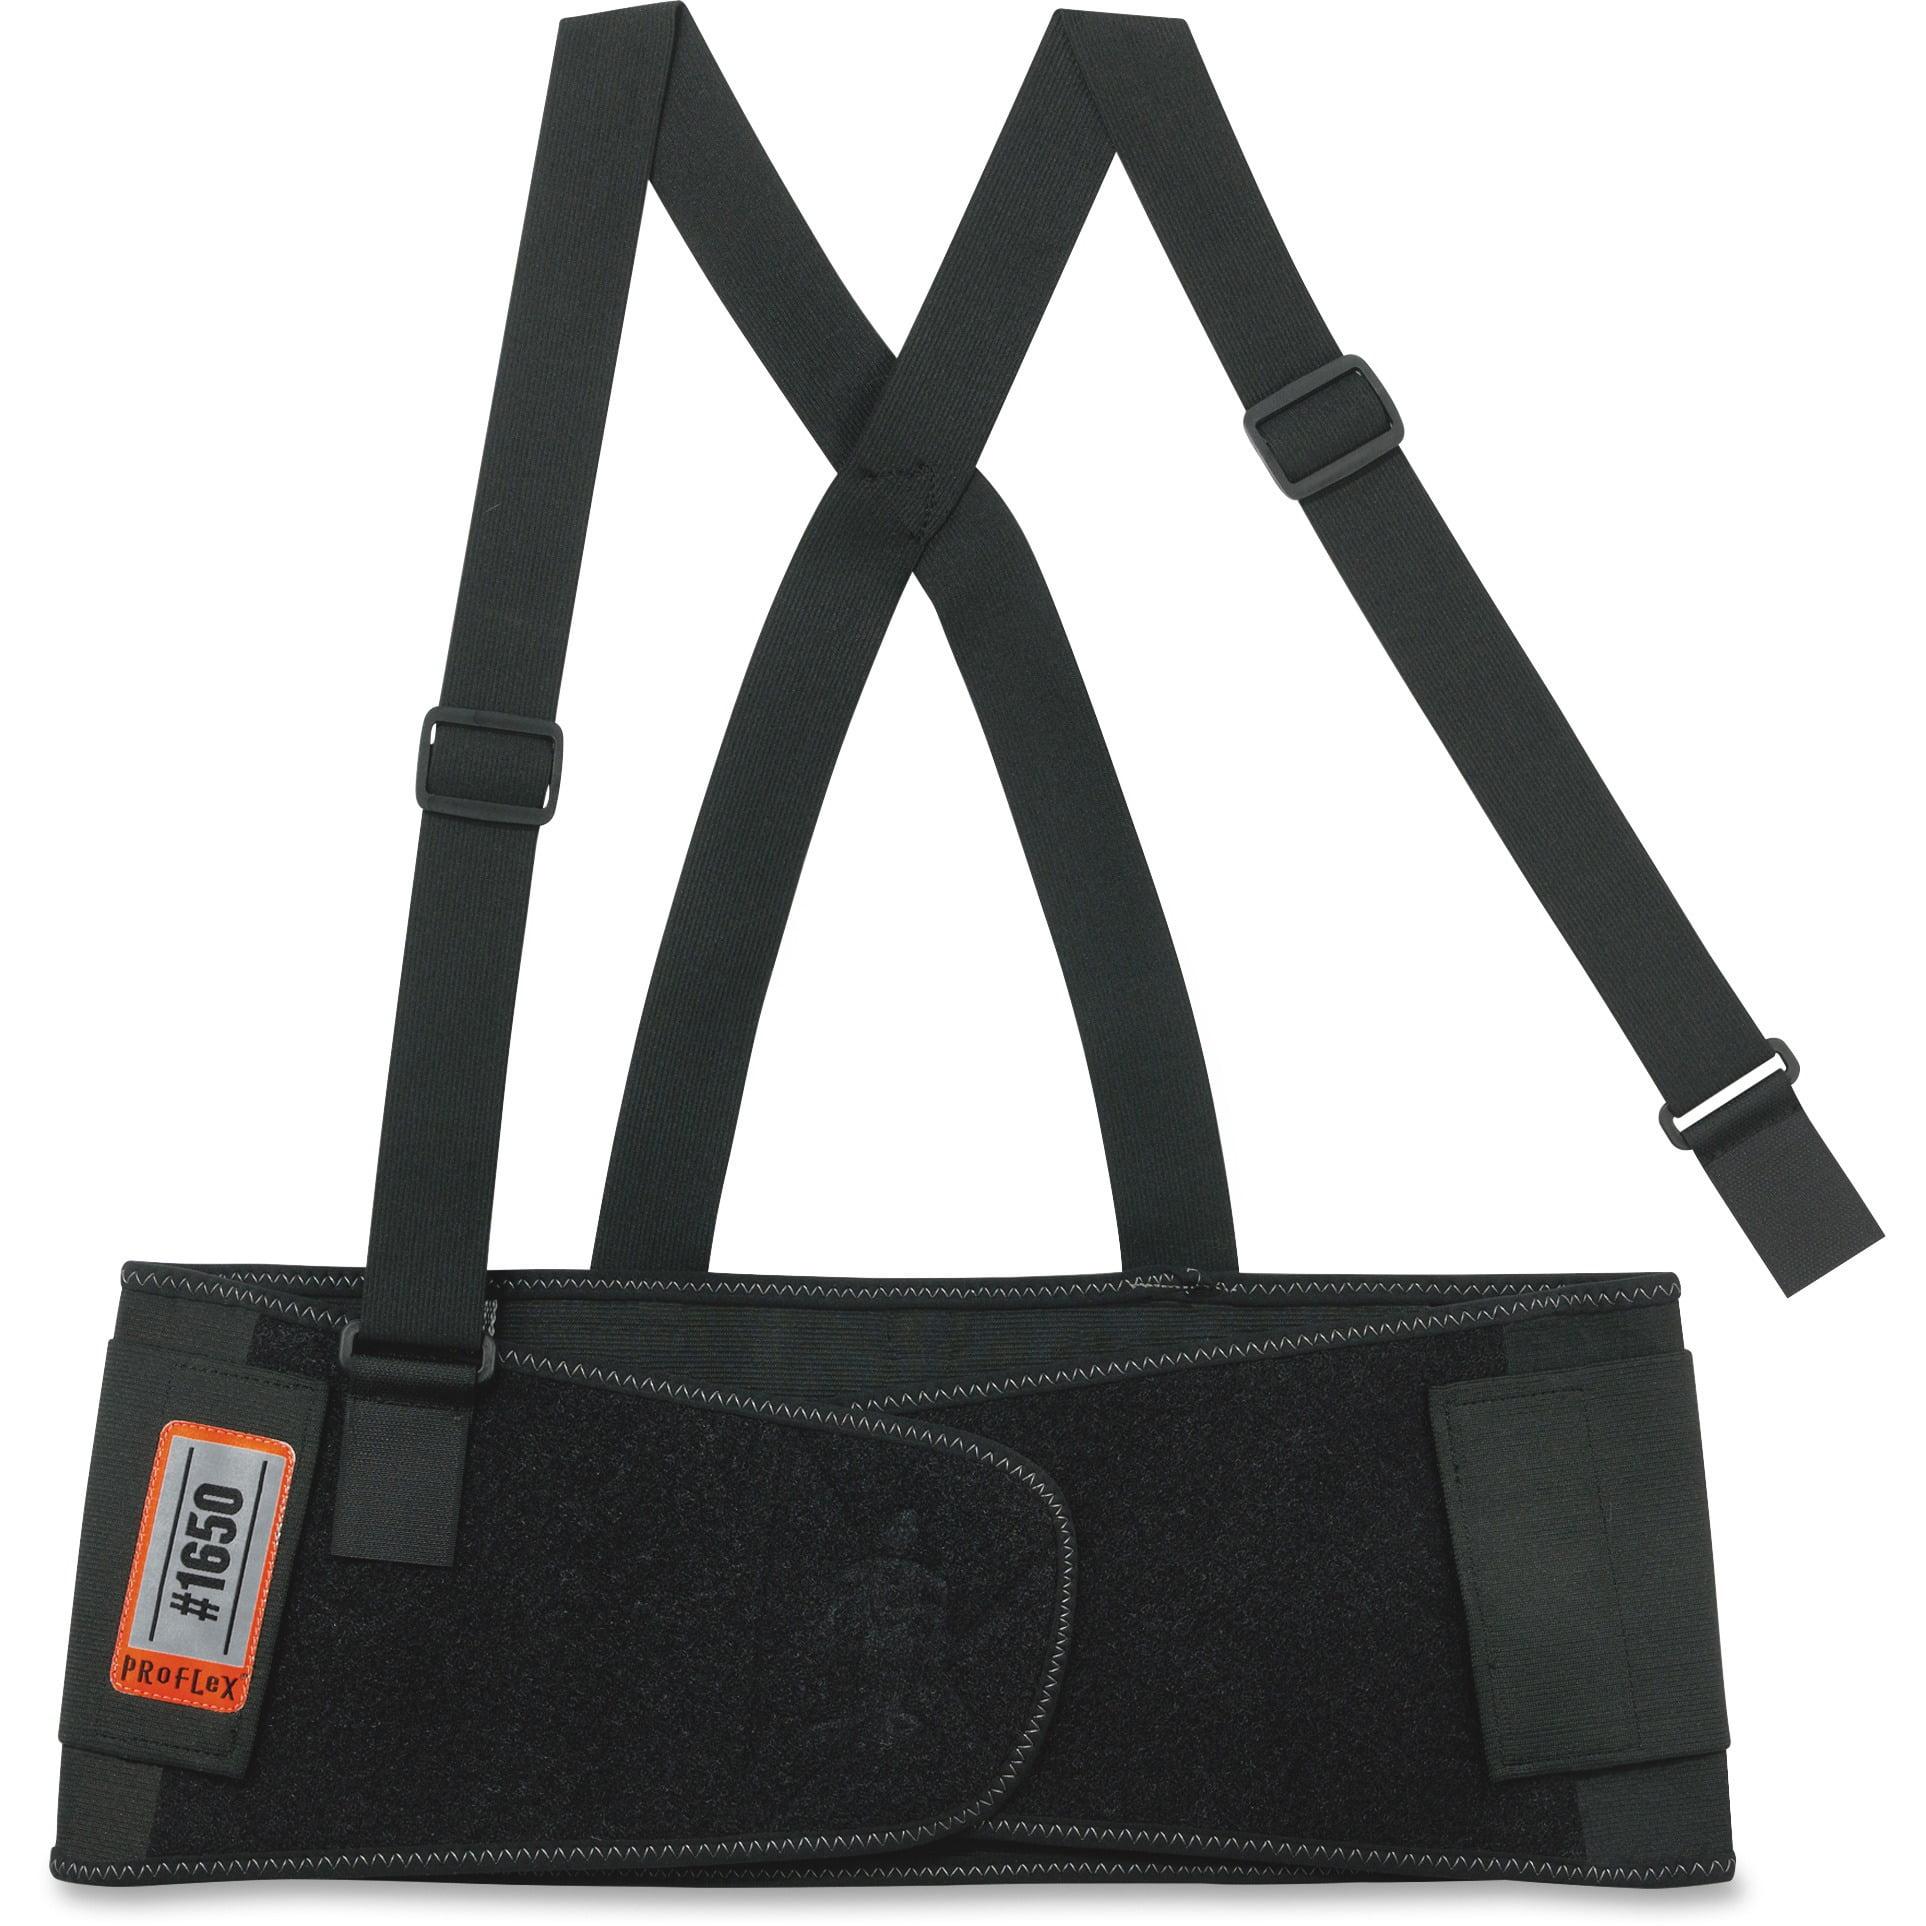 Ergodyne ProFlex 1650 Economy Elastic Back Support Belt, XL